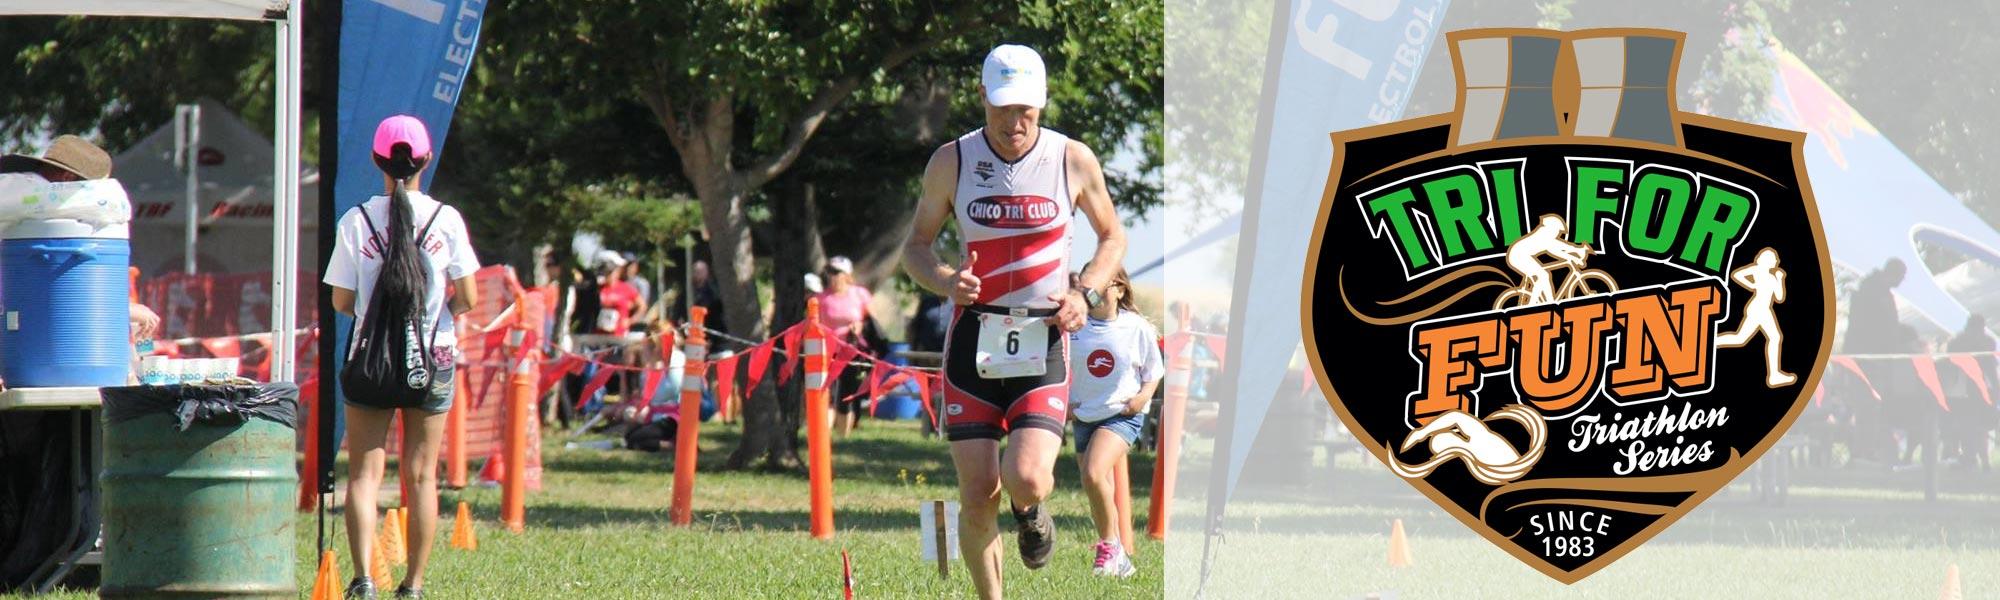 TRI for FUN Sprint Triathlon and Super Sprint Triathlon